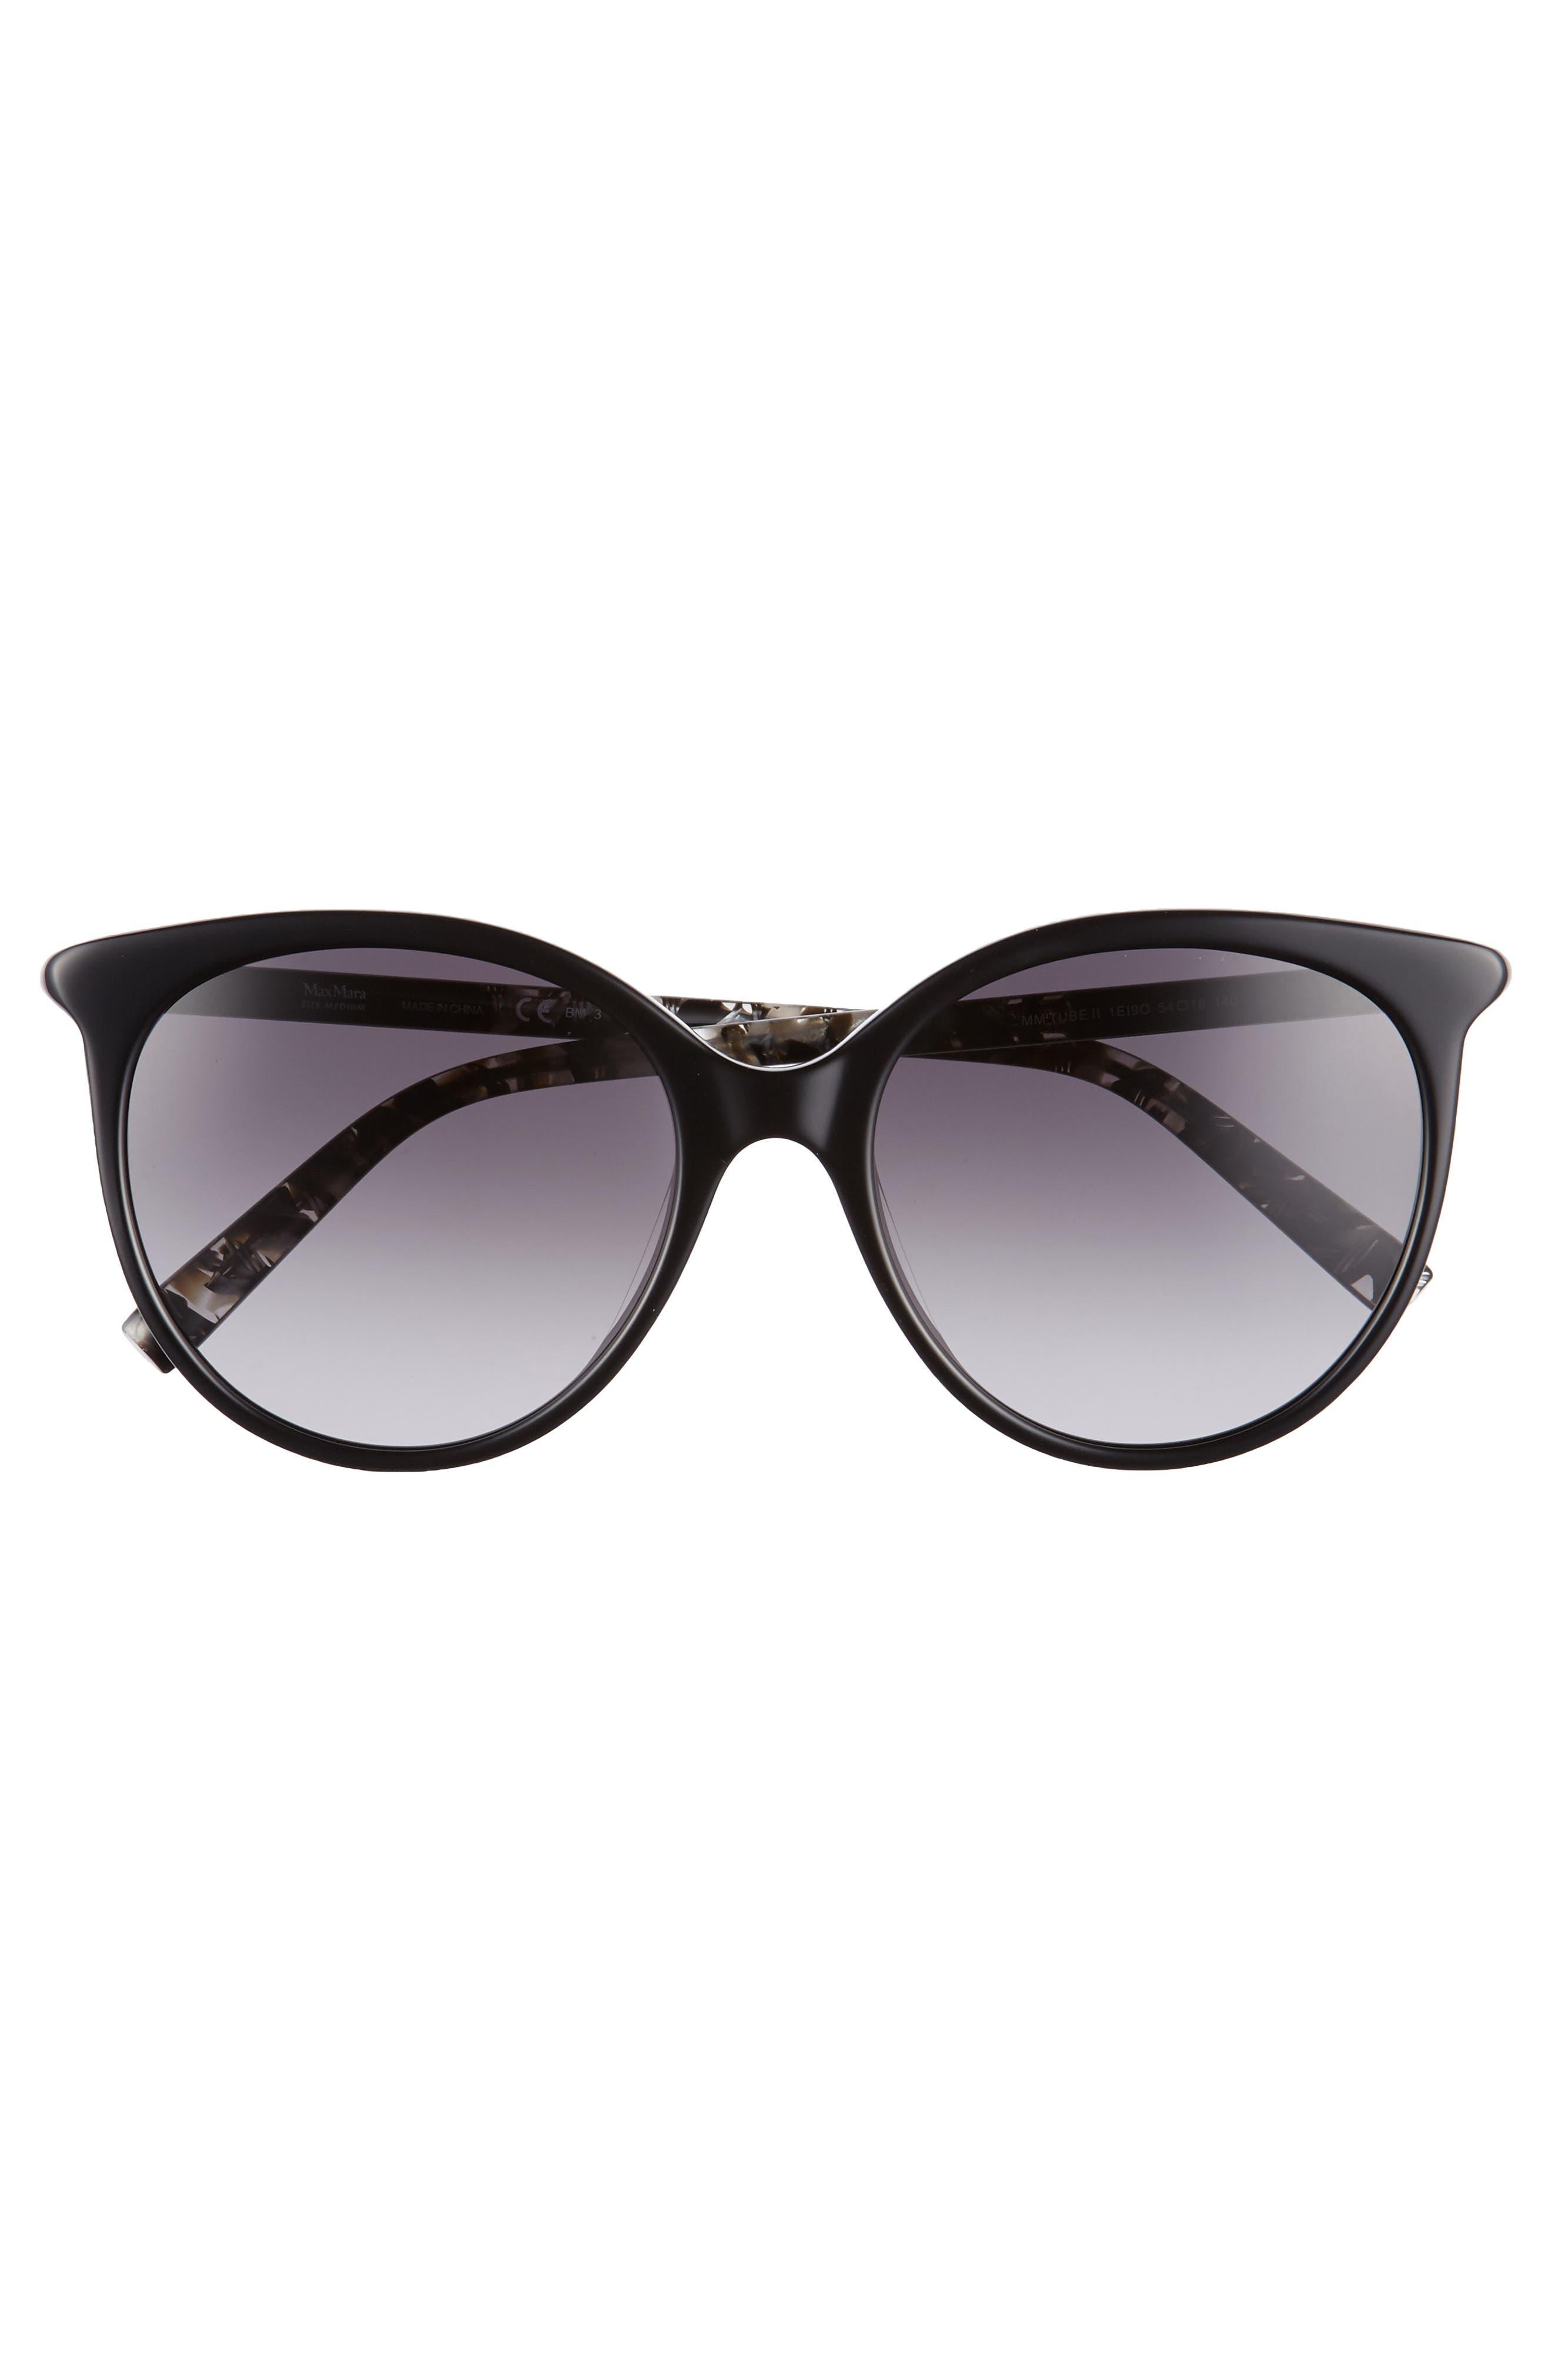 Alternate Image 3  - Max Mara Tube 54mm Gradient Lens Cat Eye Sunglasses